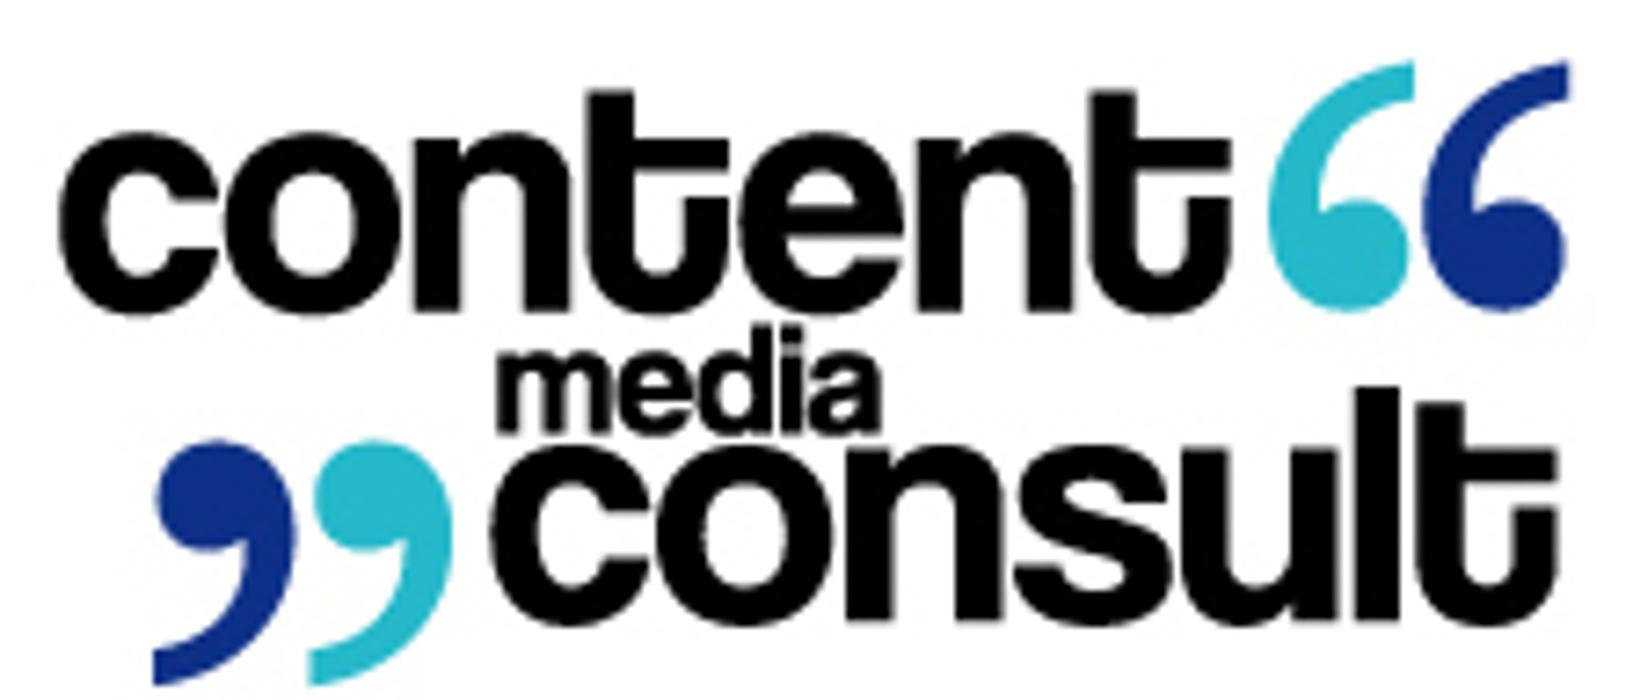 Bild zu Handpanexpress - Content Media Consult GmbH in München